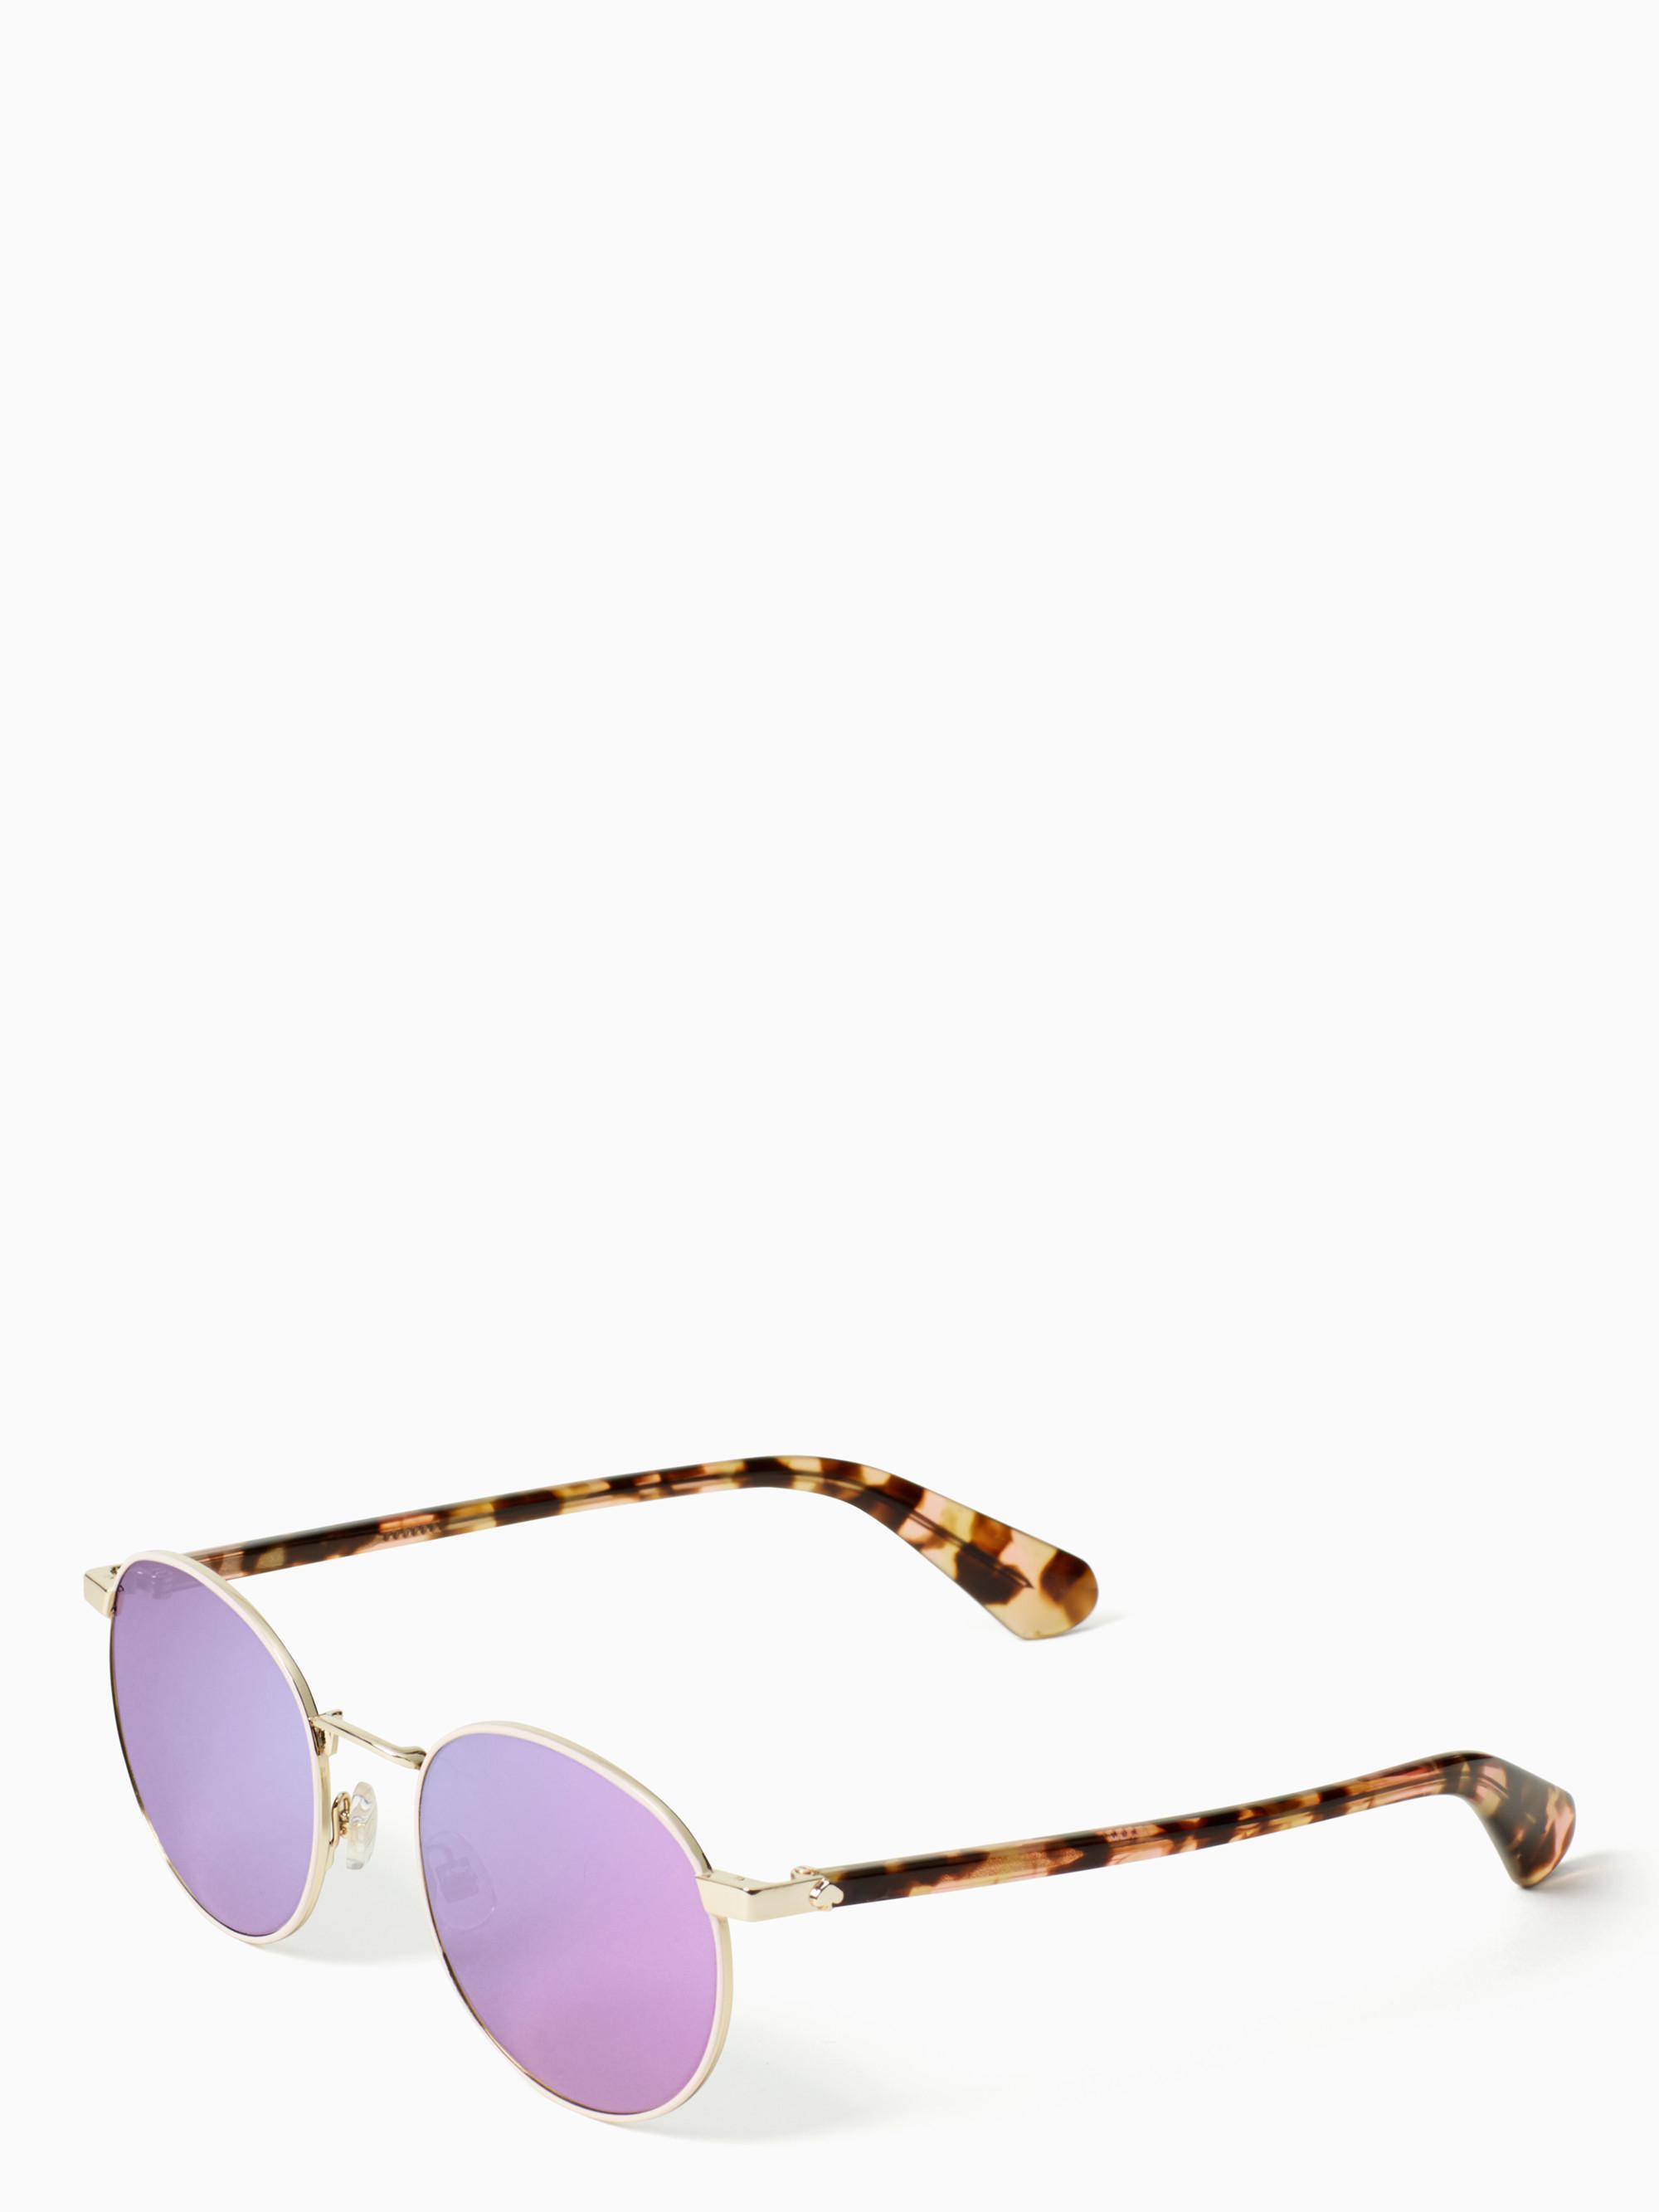 2eb022463d Lyst - Kate Spade Adelais Sunglasses